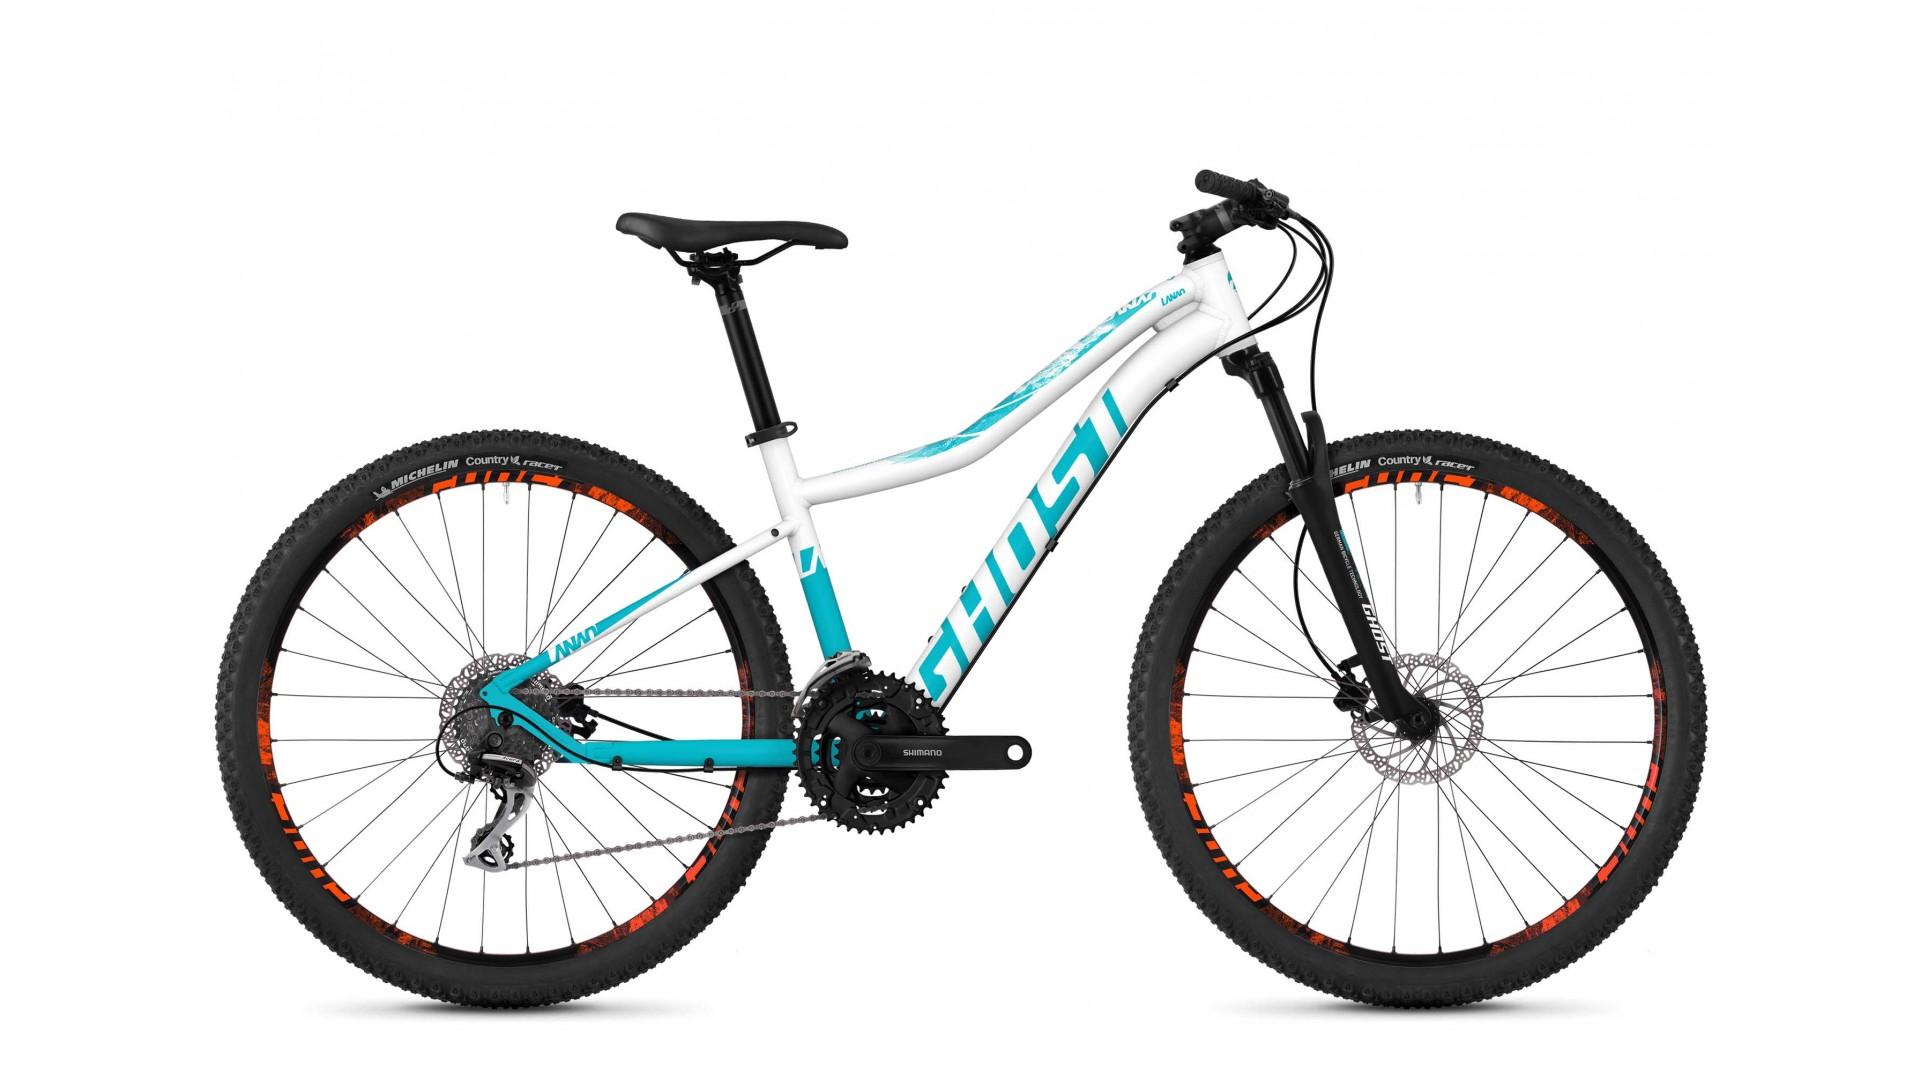 Велосипед GHOST Lanao 2.9 AL W star white / electric blue / neon orange год 2018